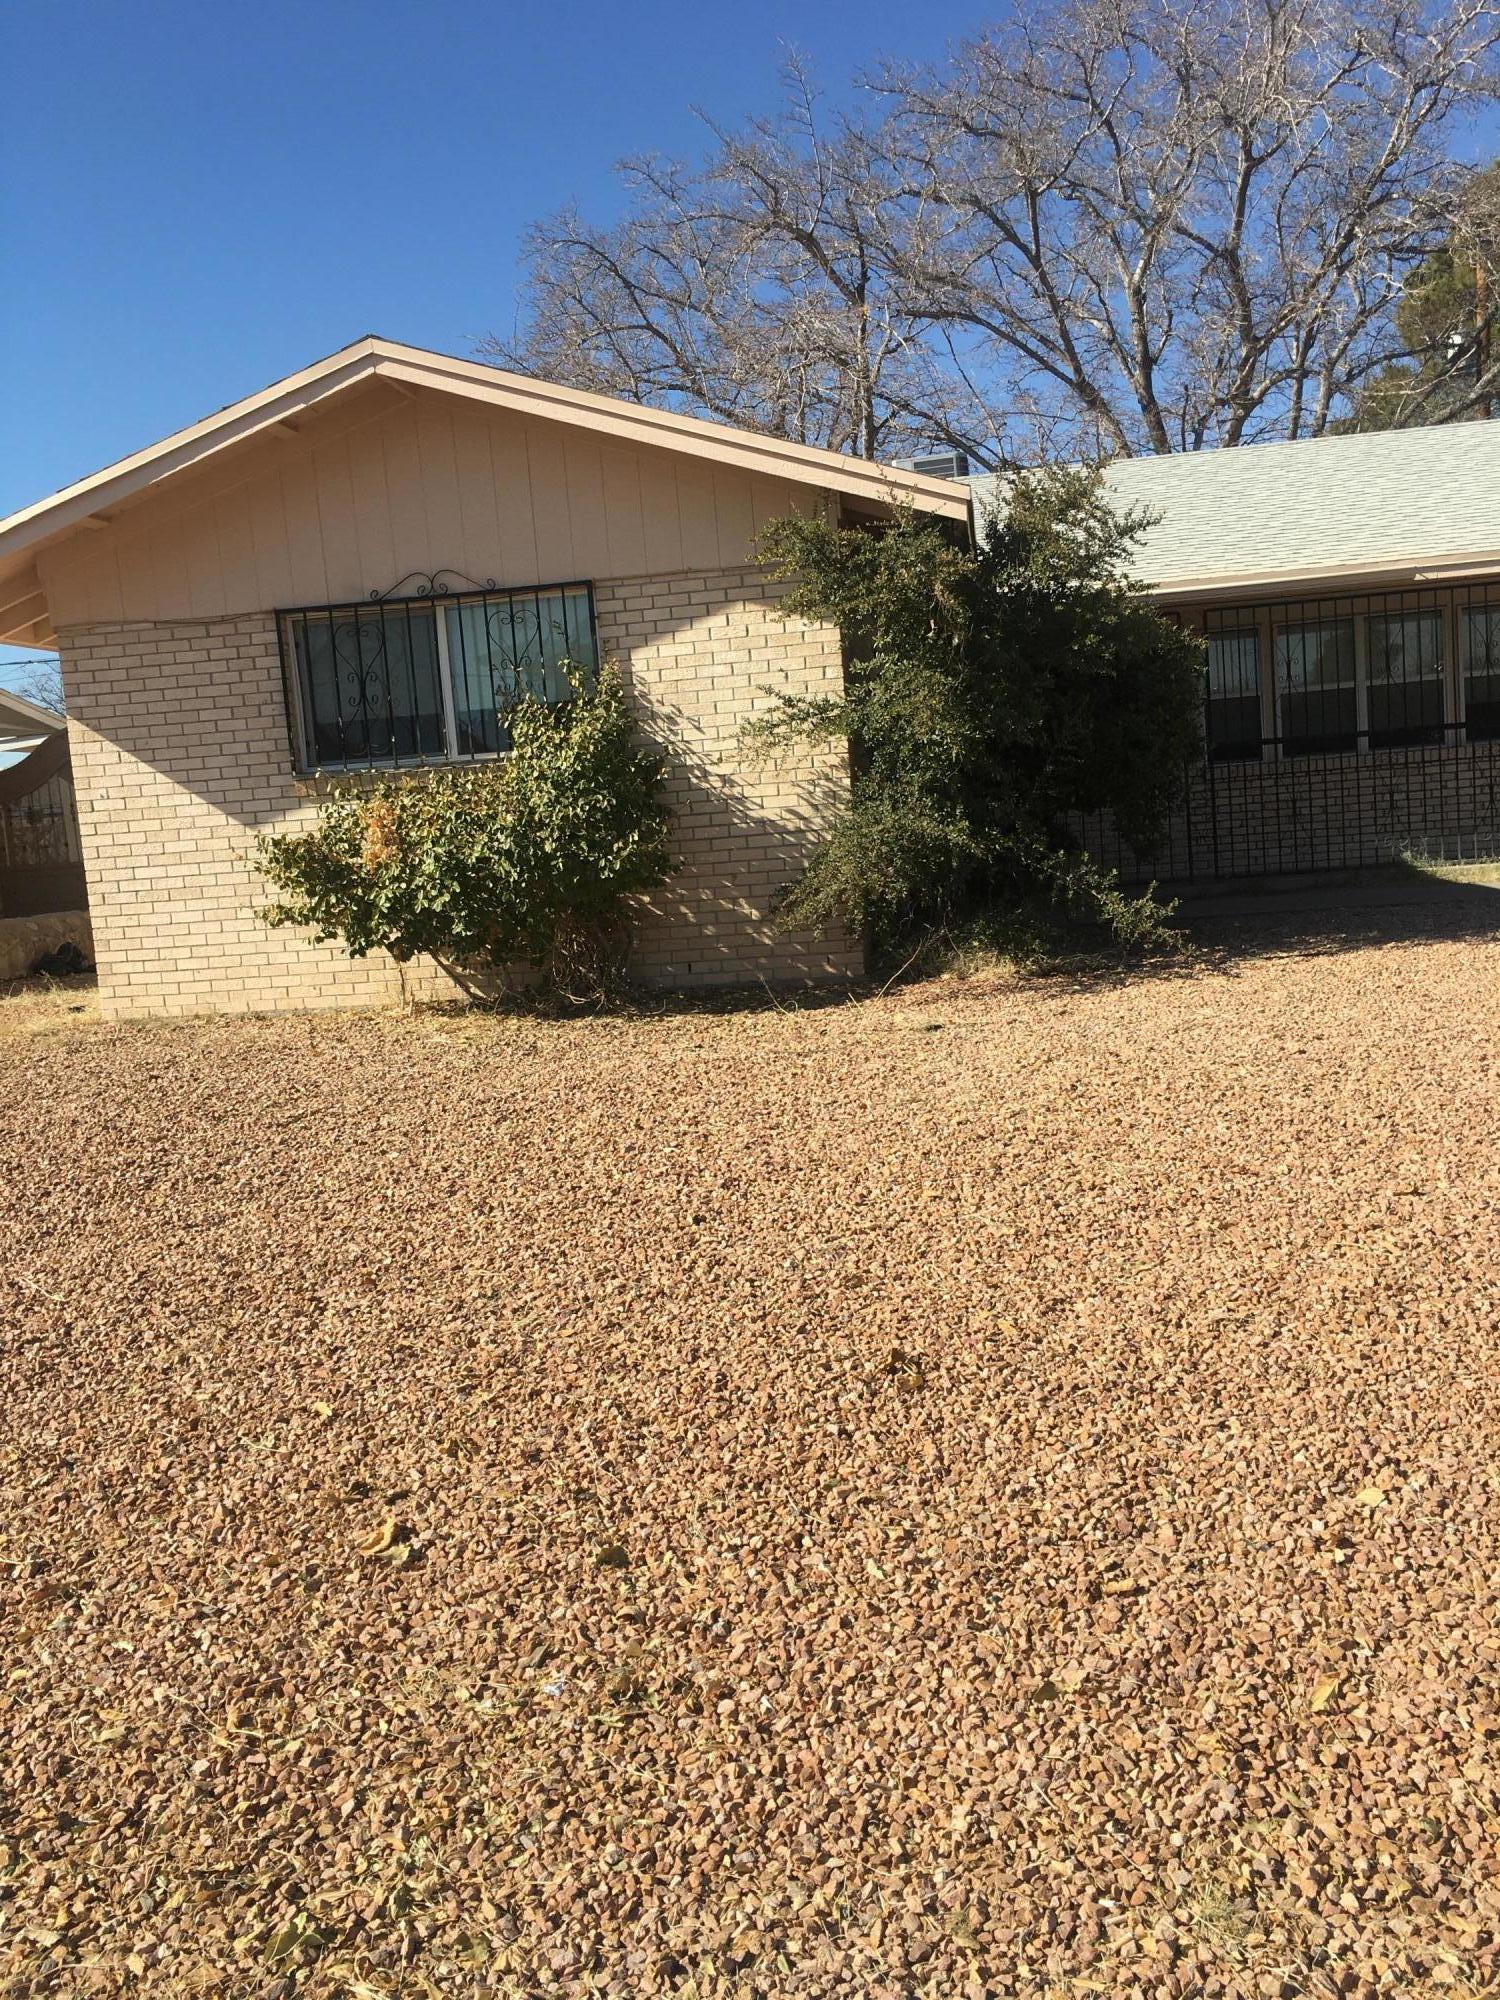 3215 Donegal Road, El Paso, Texas 79925, 4 Bedrooms Bedrooms, ,2 BathroomsBathrooms,Residential Rental,For Rent,Donegal,839647